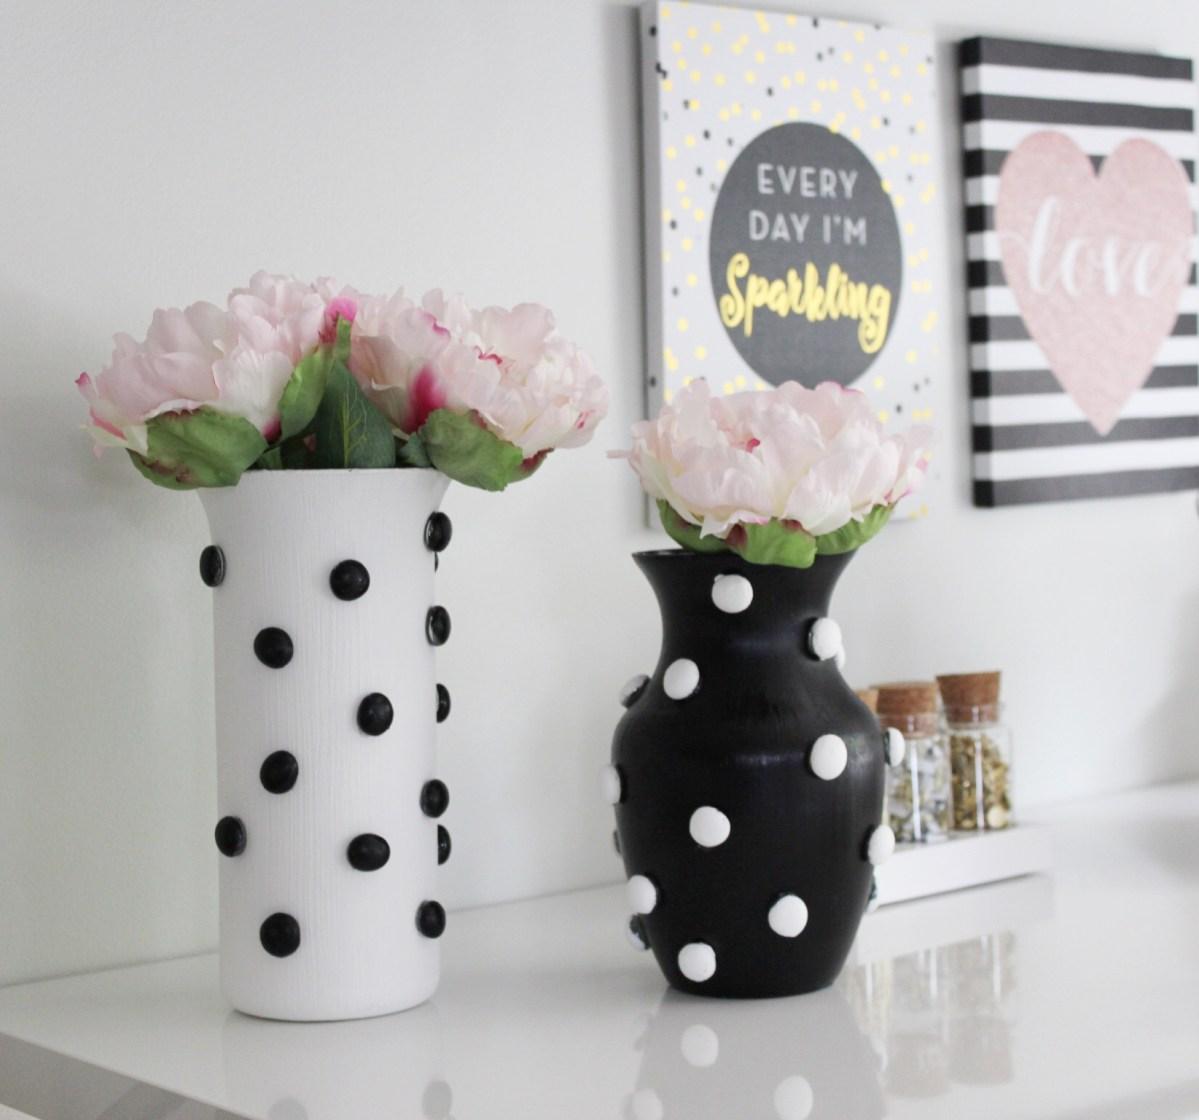 Designer Inspired Vase DIY